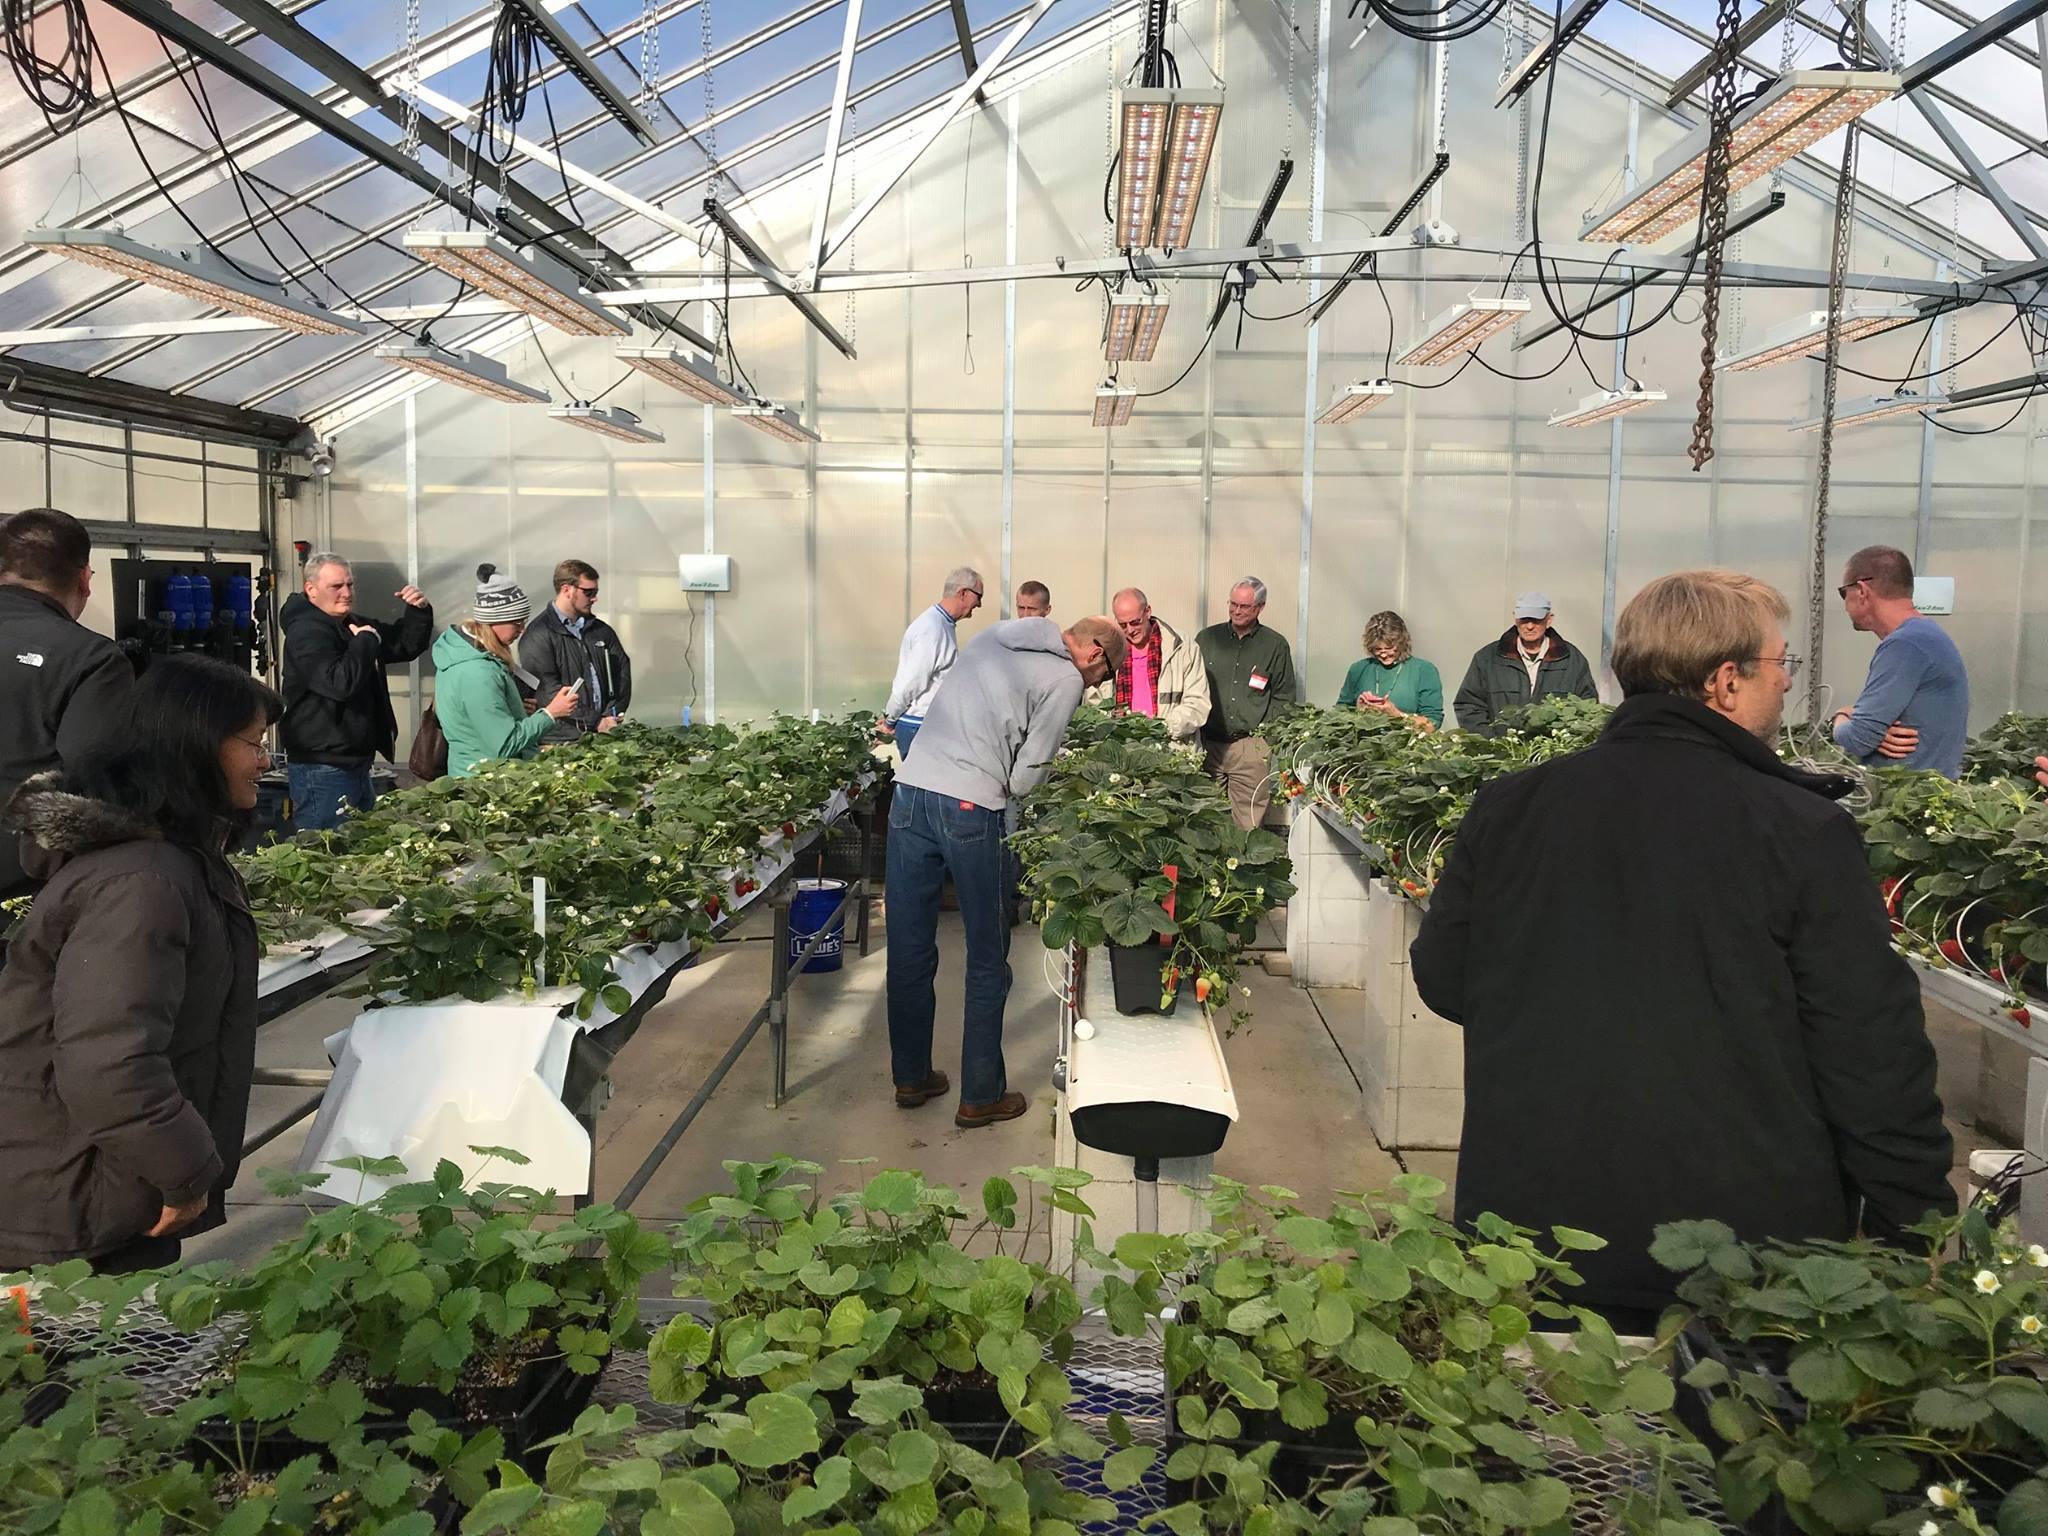 GREENHOUSE MANAGEMENT WORKSHOP 2020: Sustainable & Safe Crop Production